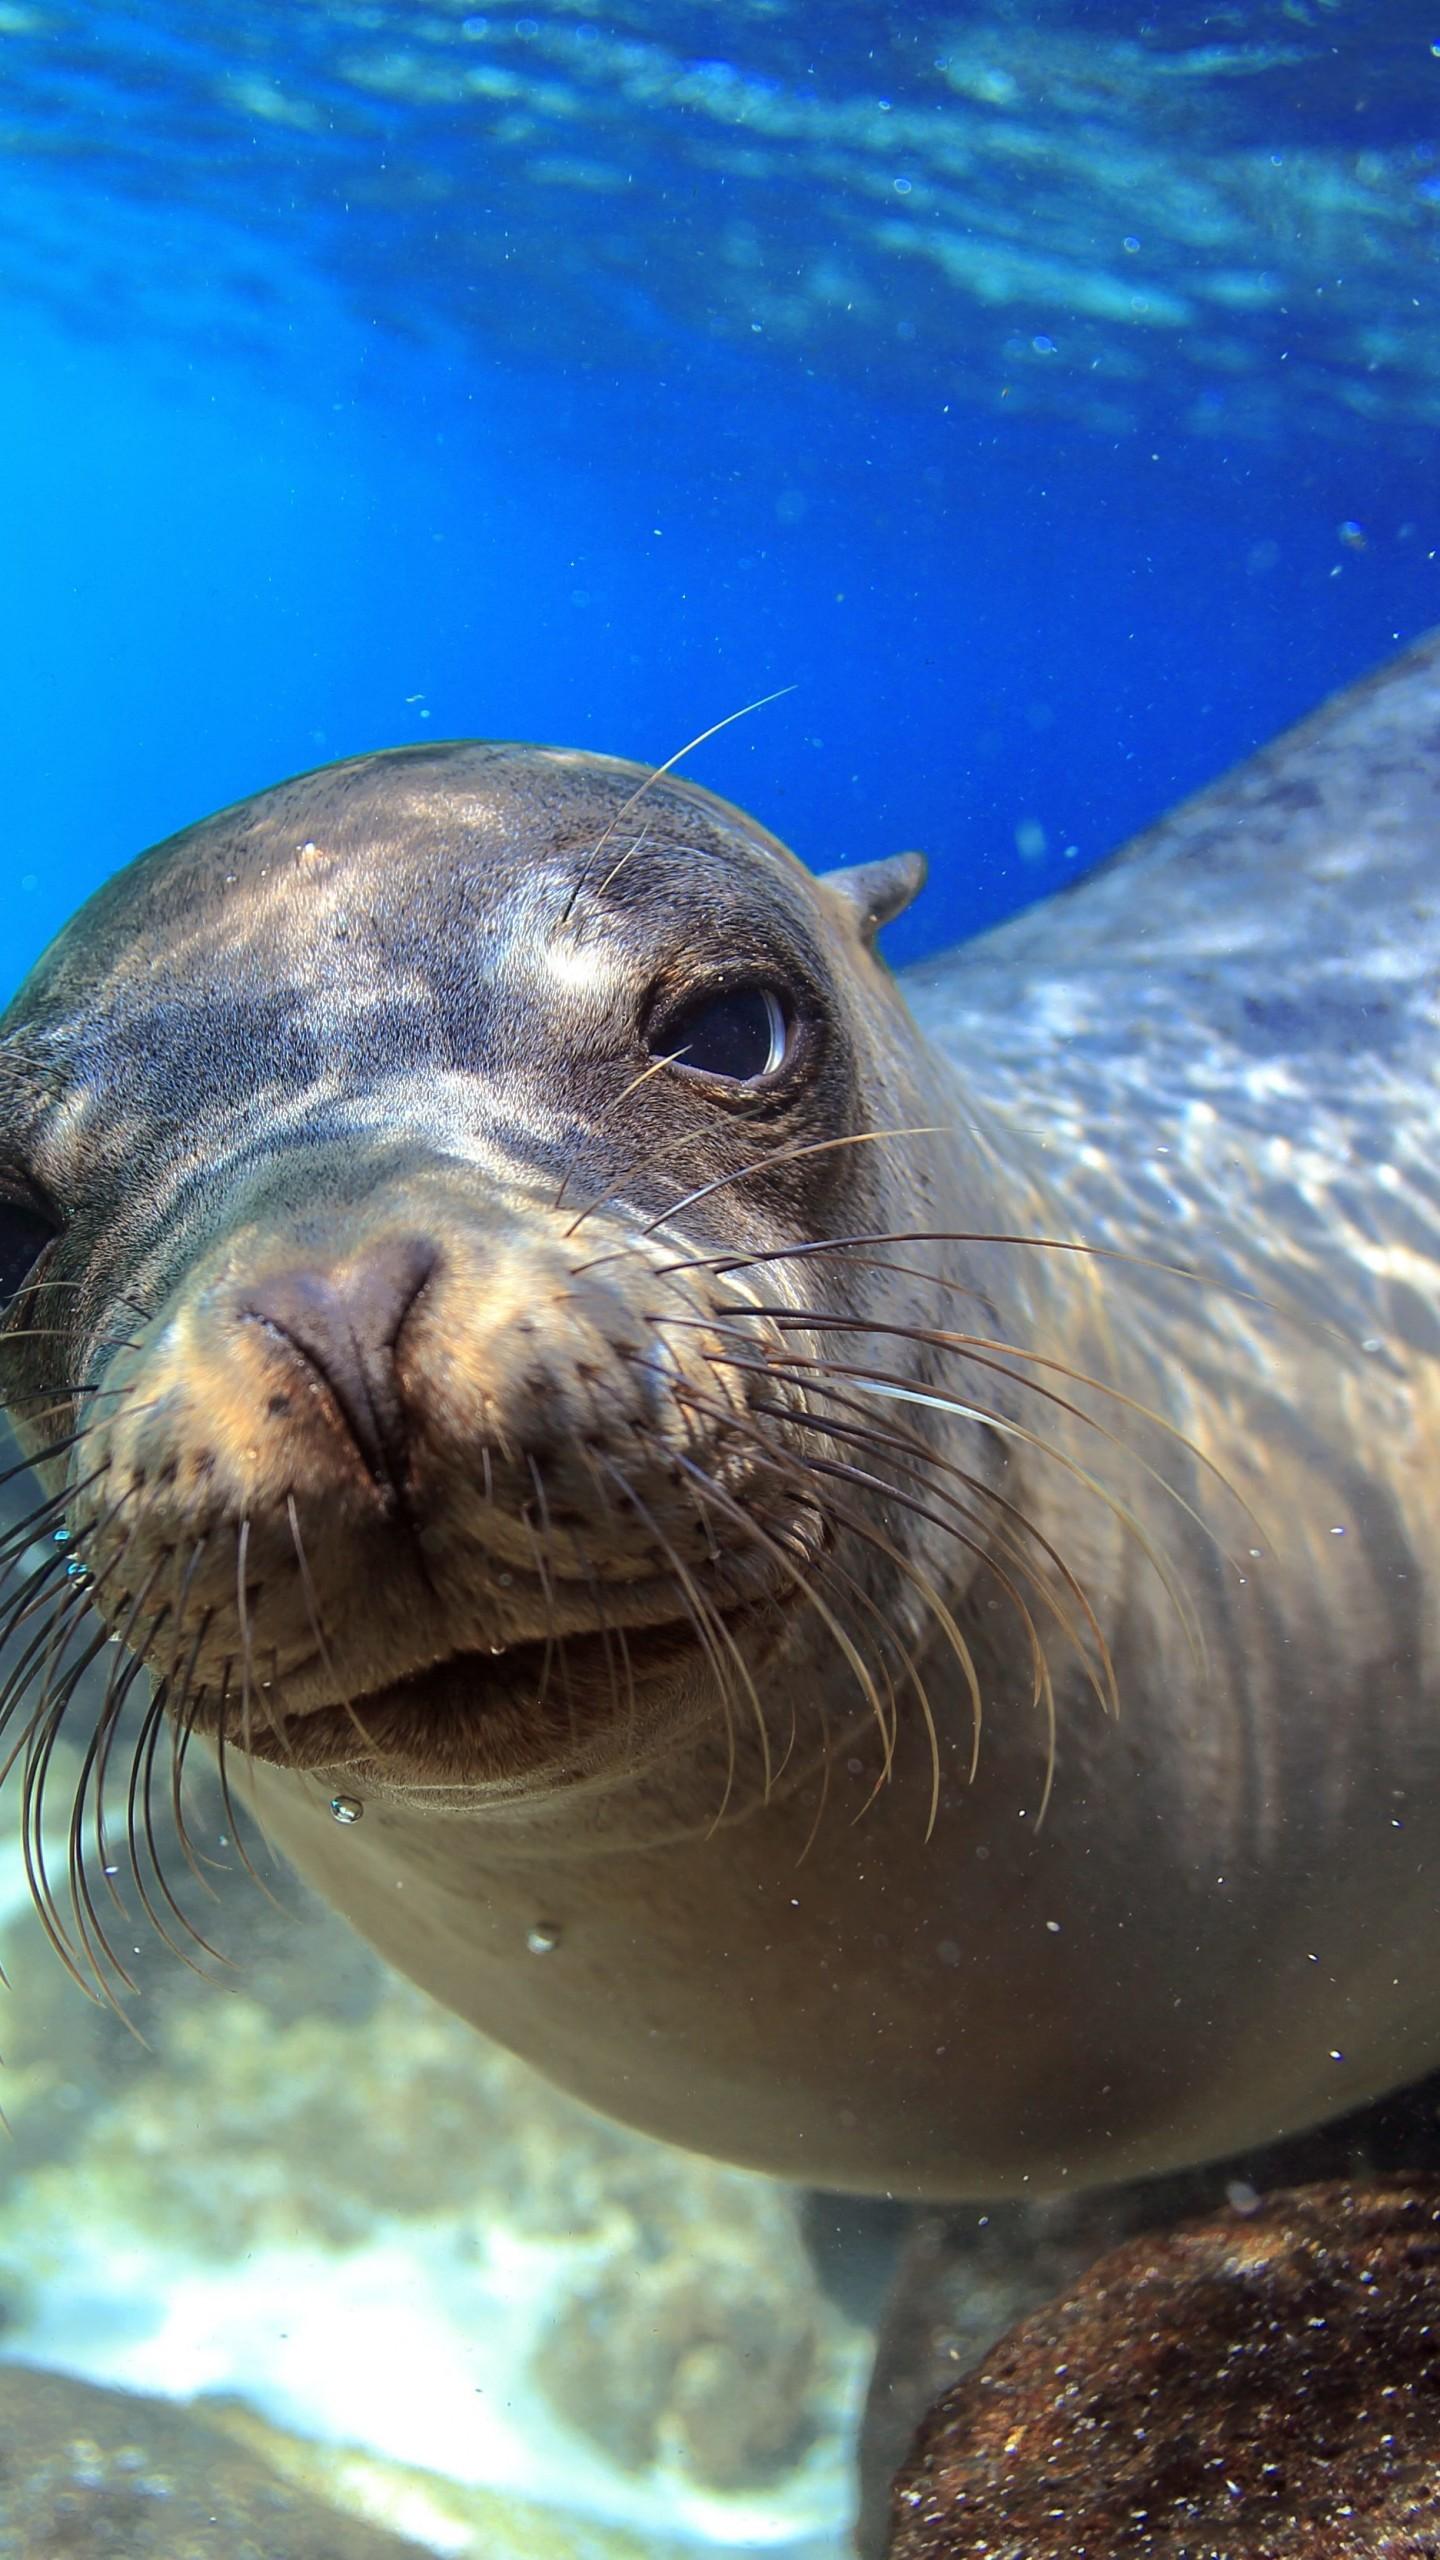 Wallpapers Cool Quotes Wallpaper Sea Lion Galapagos Island Ecuador Underwater